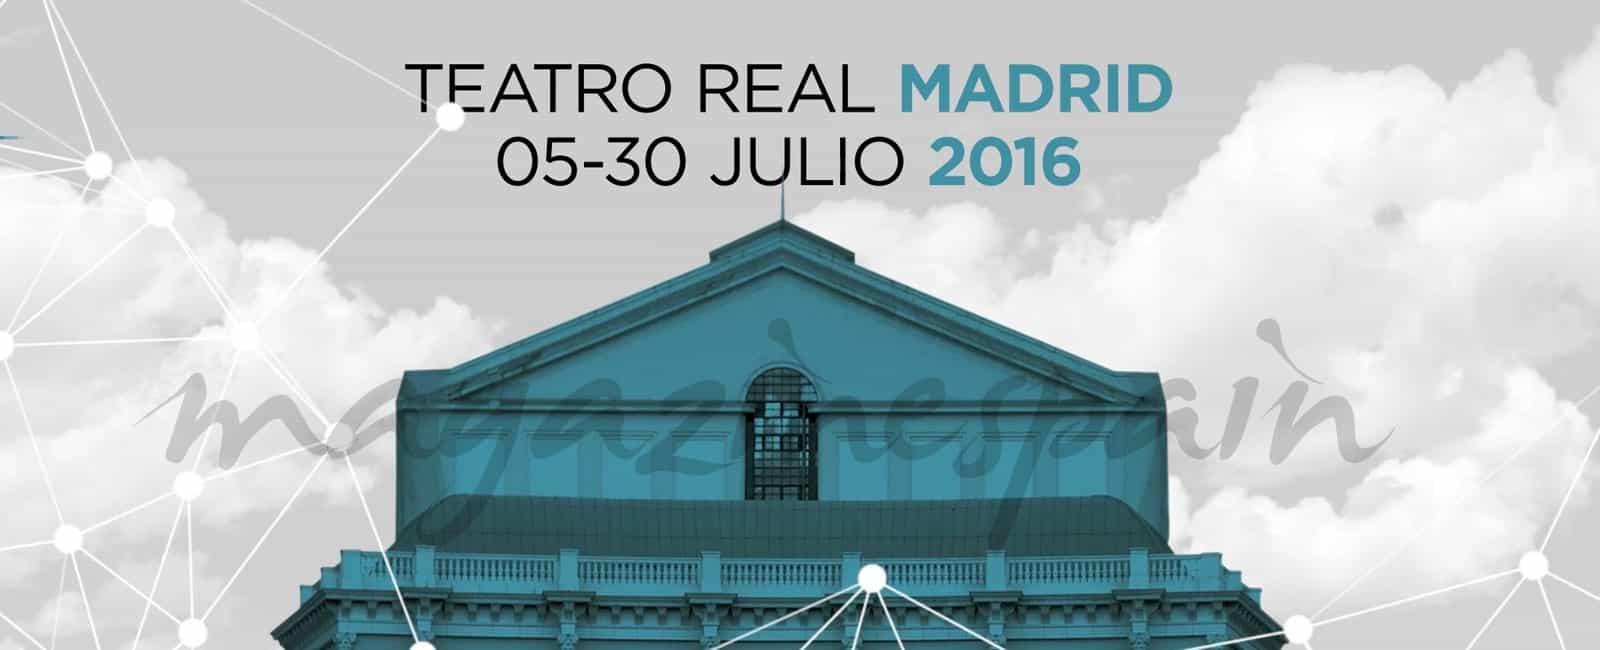 El Teatro Real abre sus puertas a la 2ª Univeral Music Festival